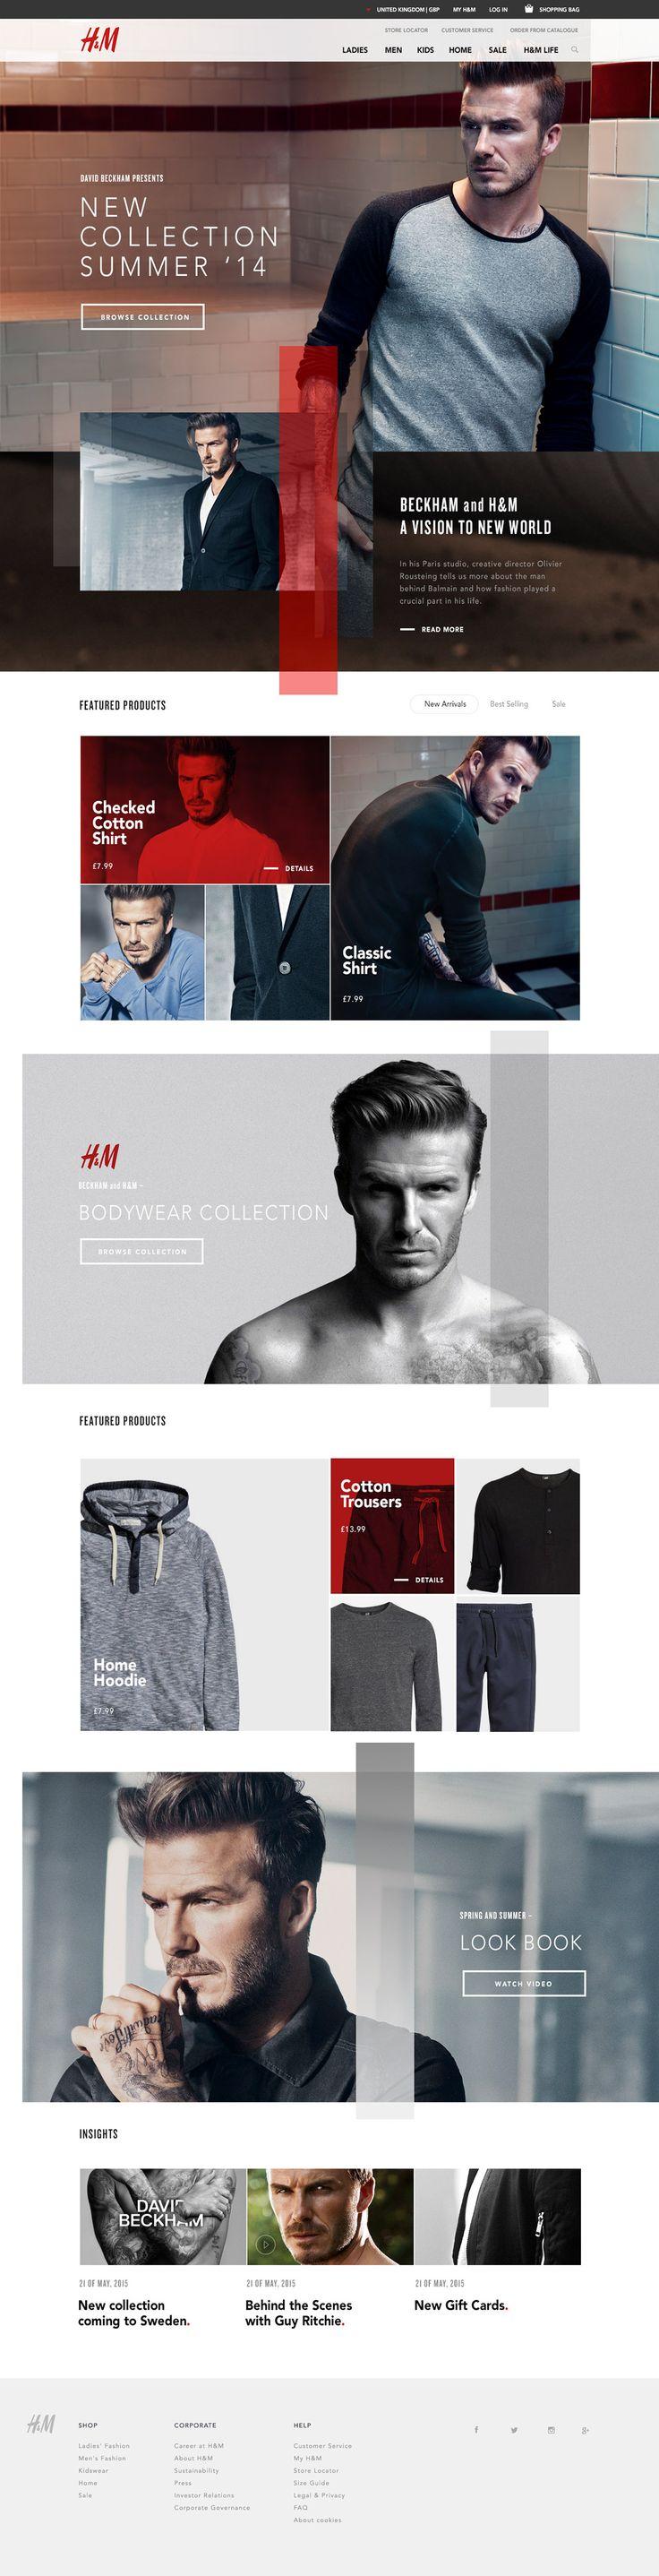 #Website #web #design #UI #layout #inspiration #beckham